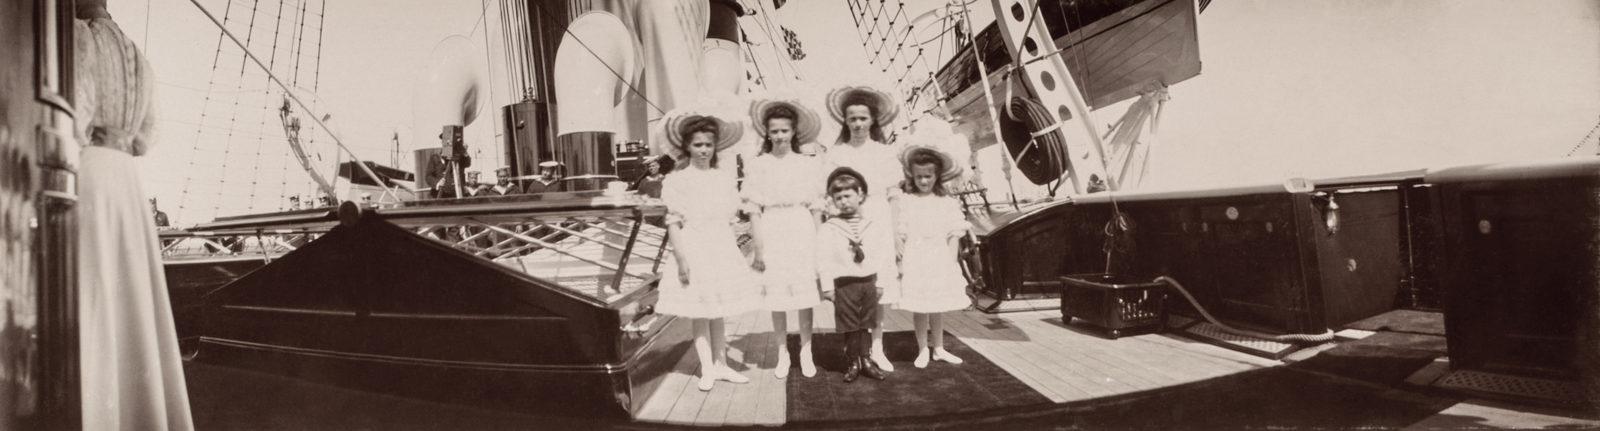 The Tsarevich Alexei and Grand Duchesses Olga, Tatiana, Maria and Anastasia aboard the Imperial yacht Standart. June 1908.